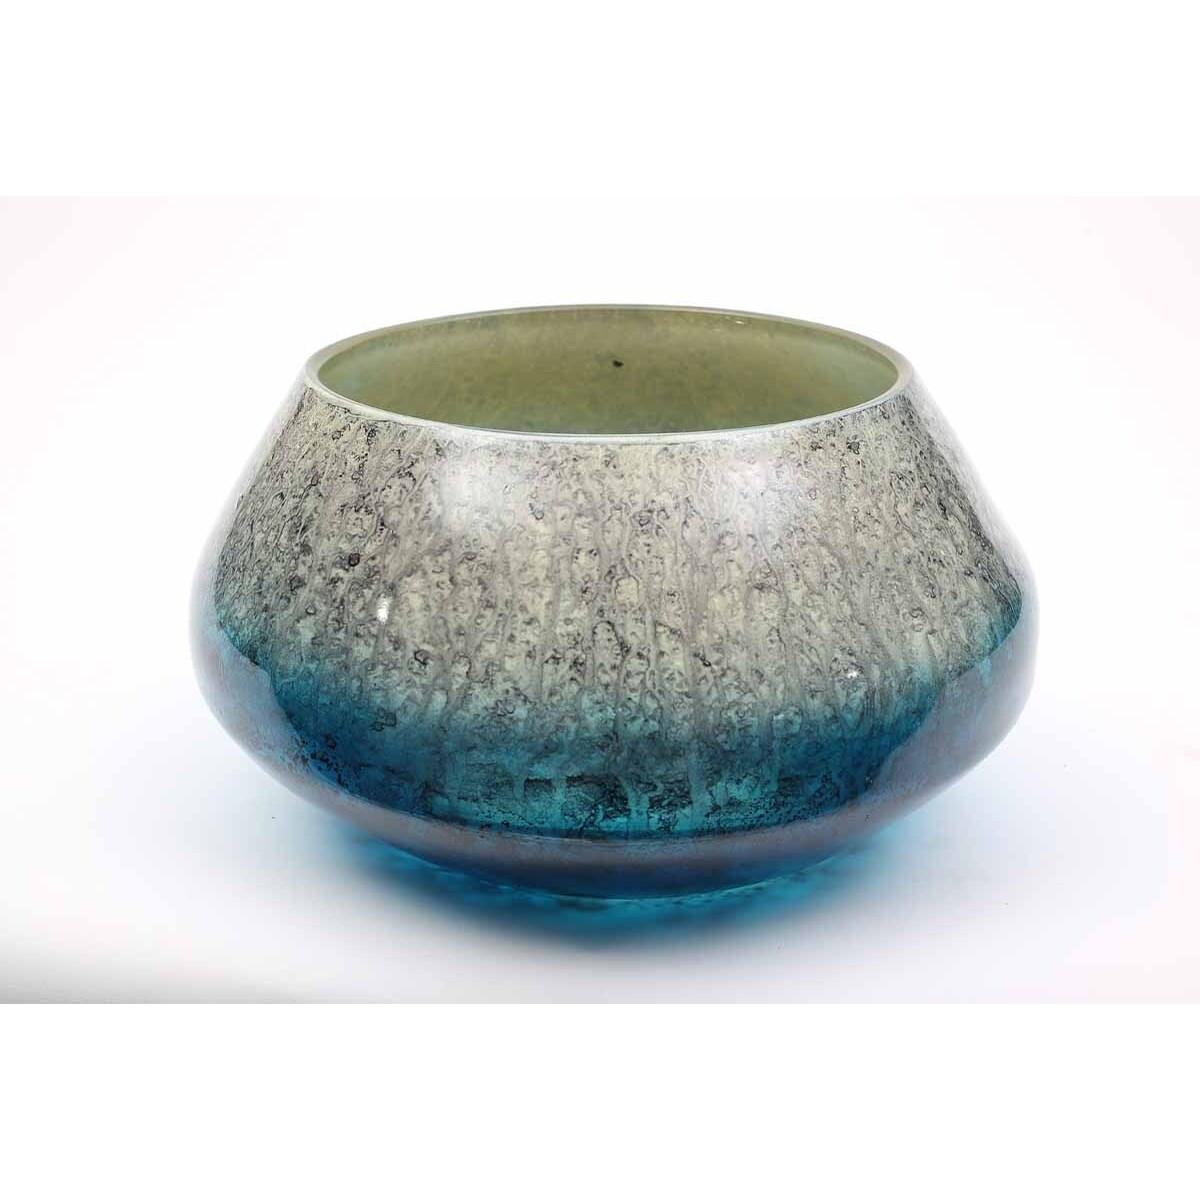 Large Bowl in Calypso Finish